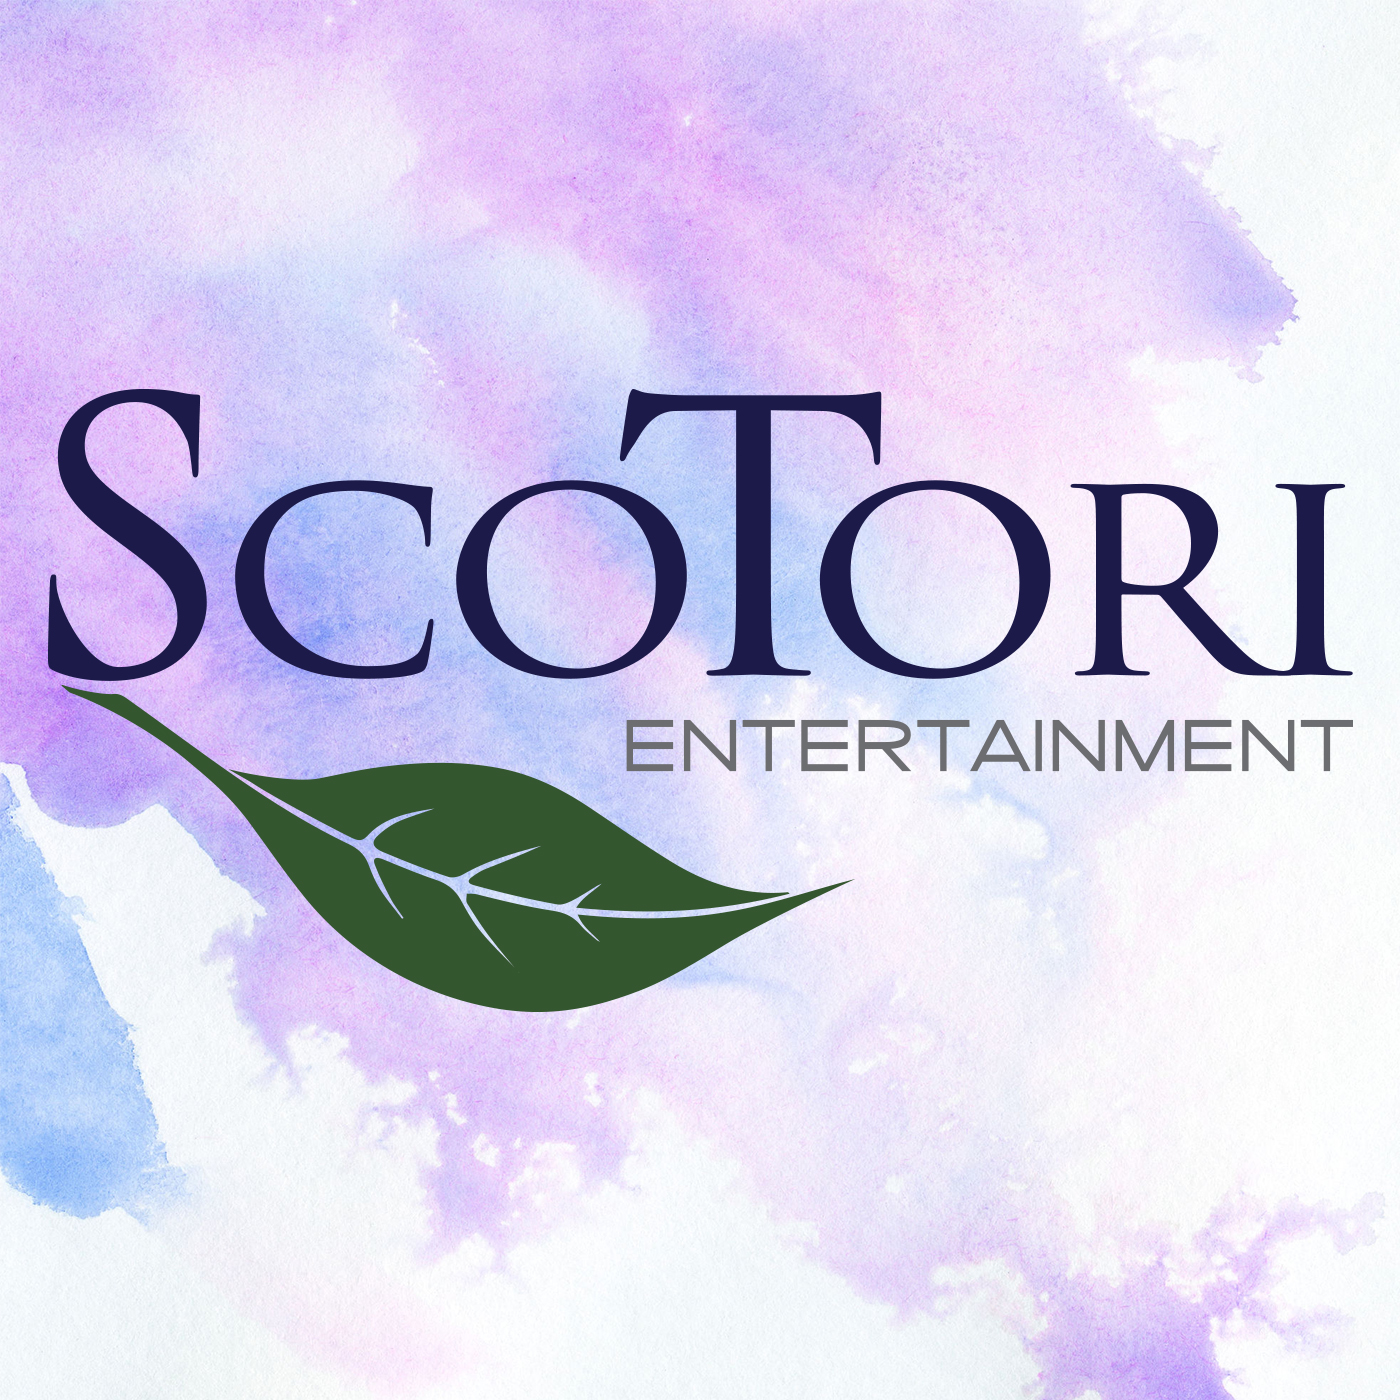 ScoTori show art